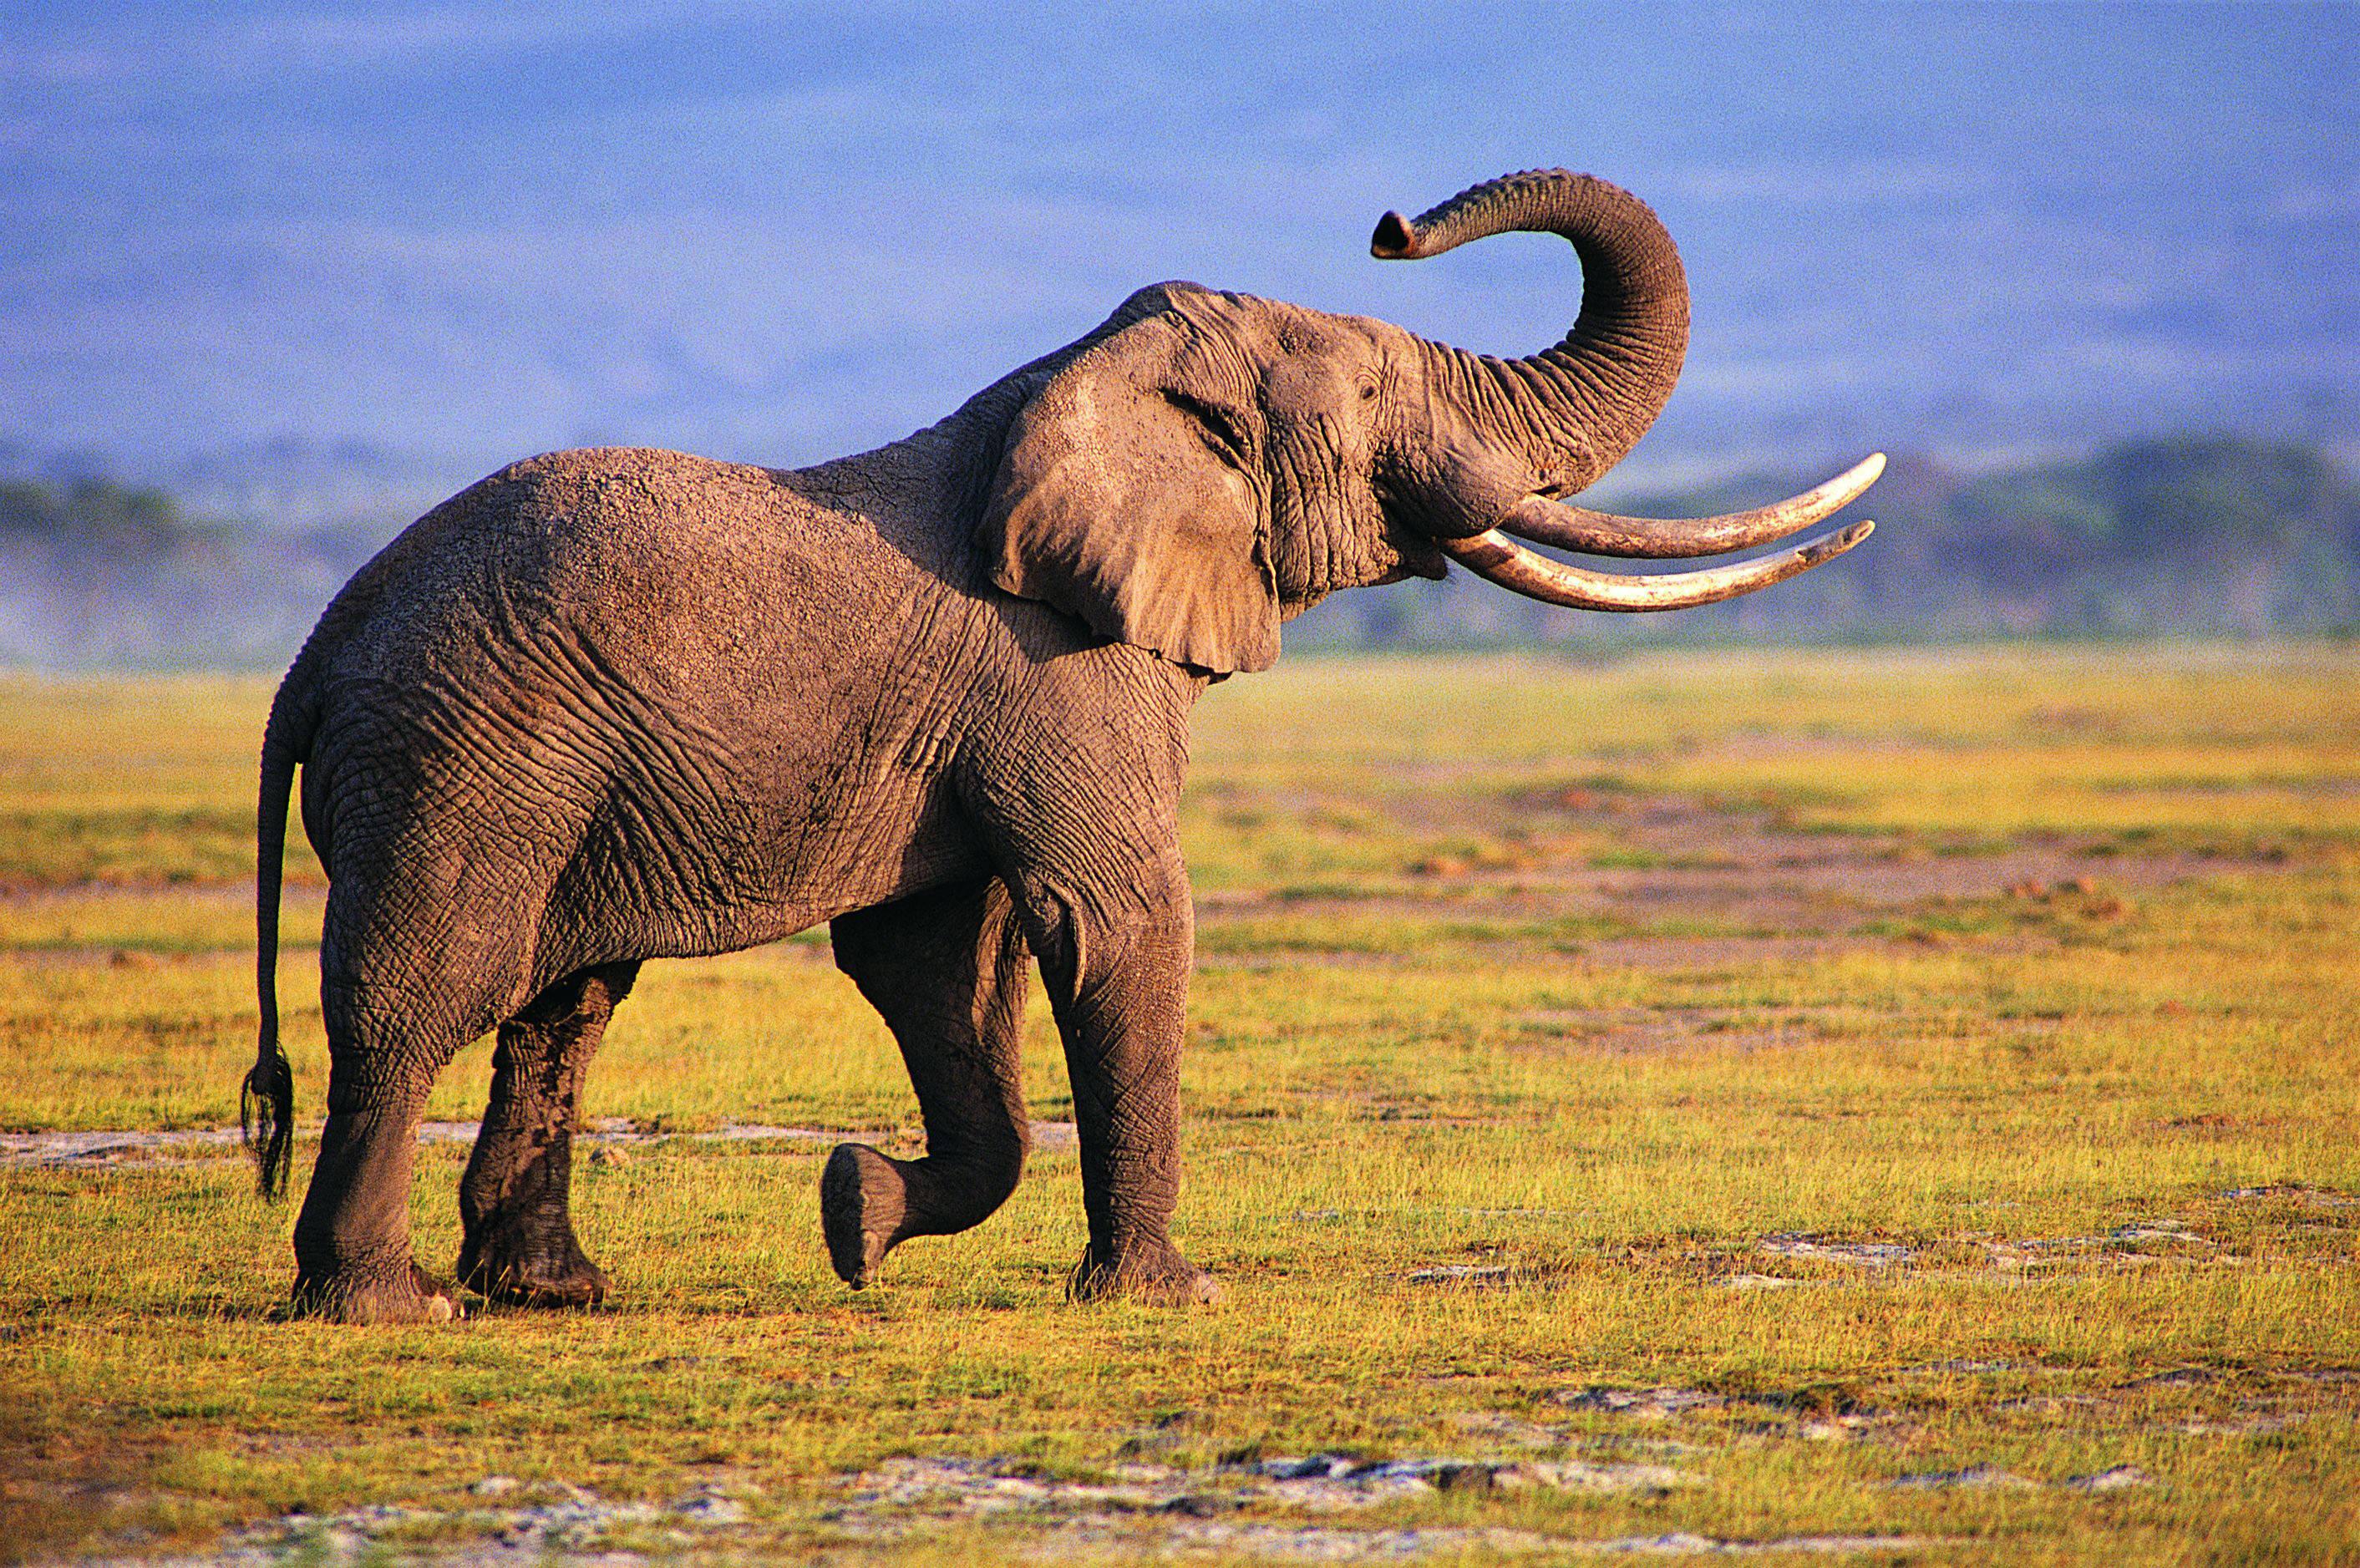 kerala elephant hd pictures